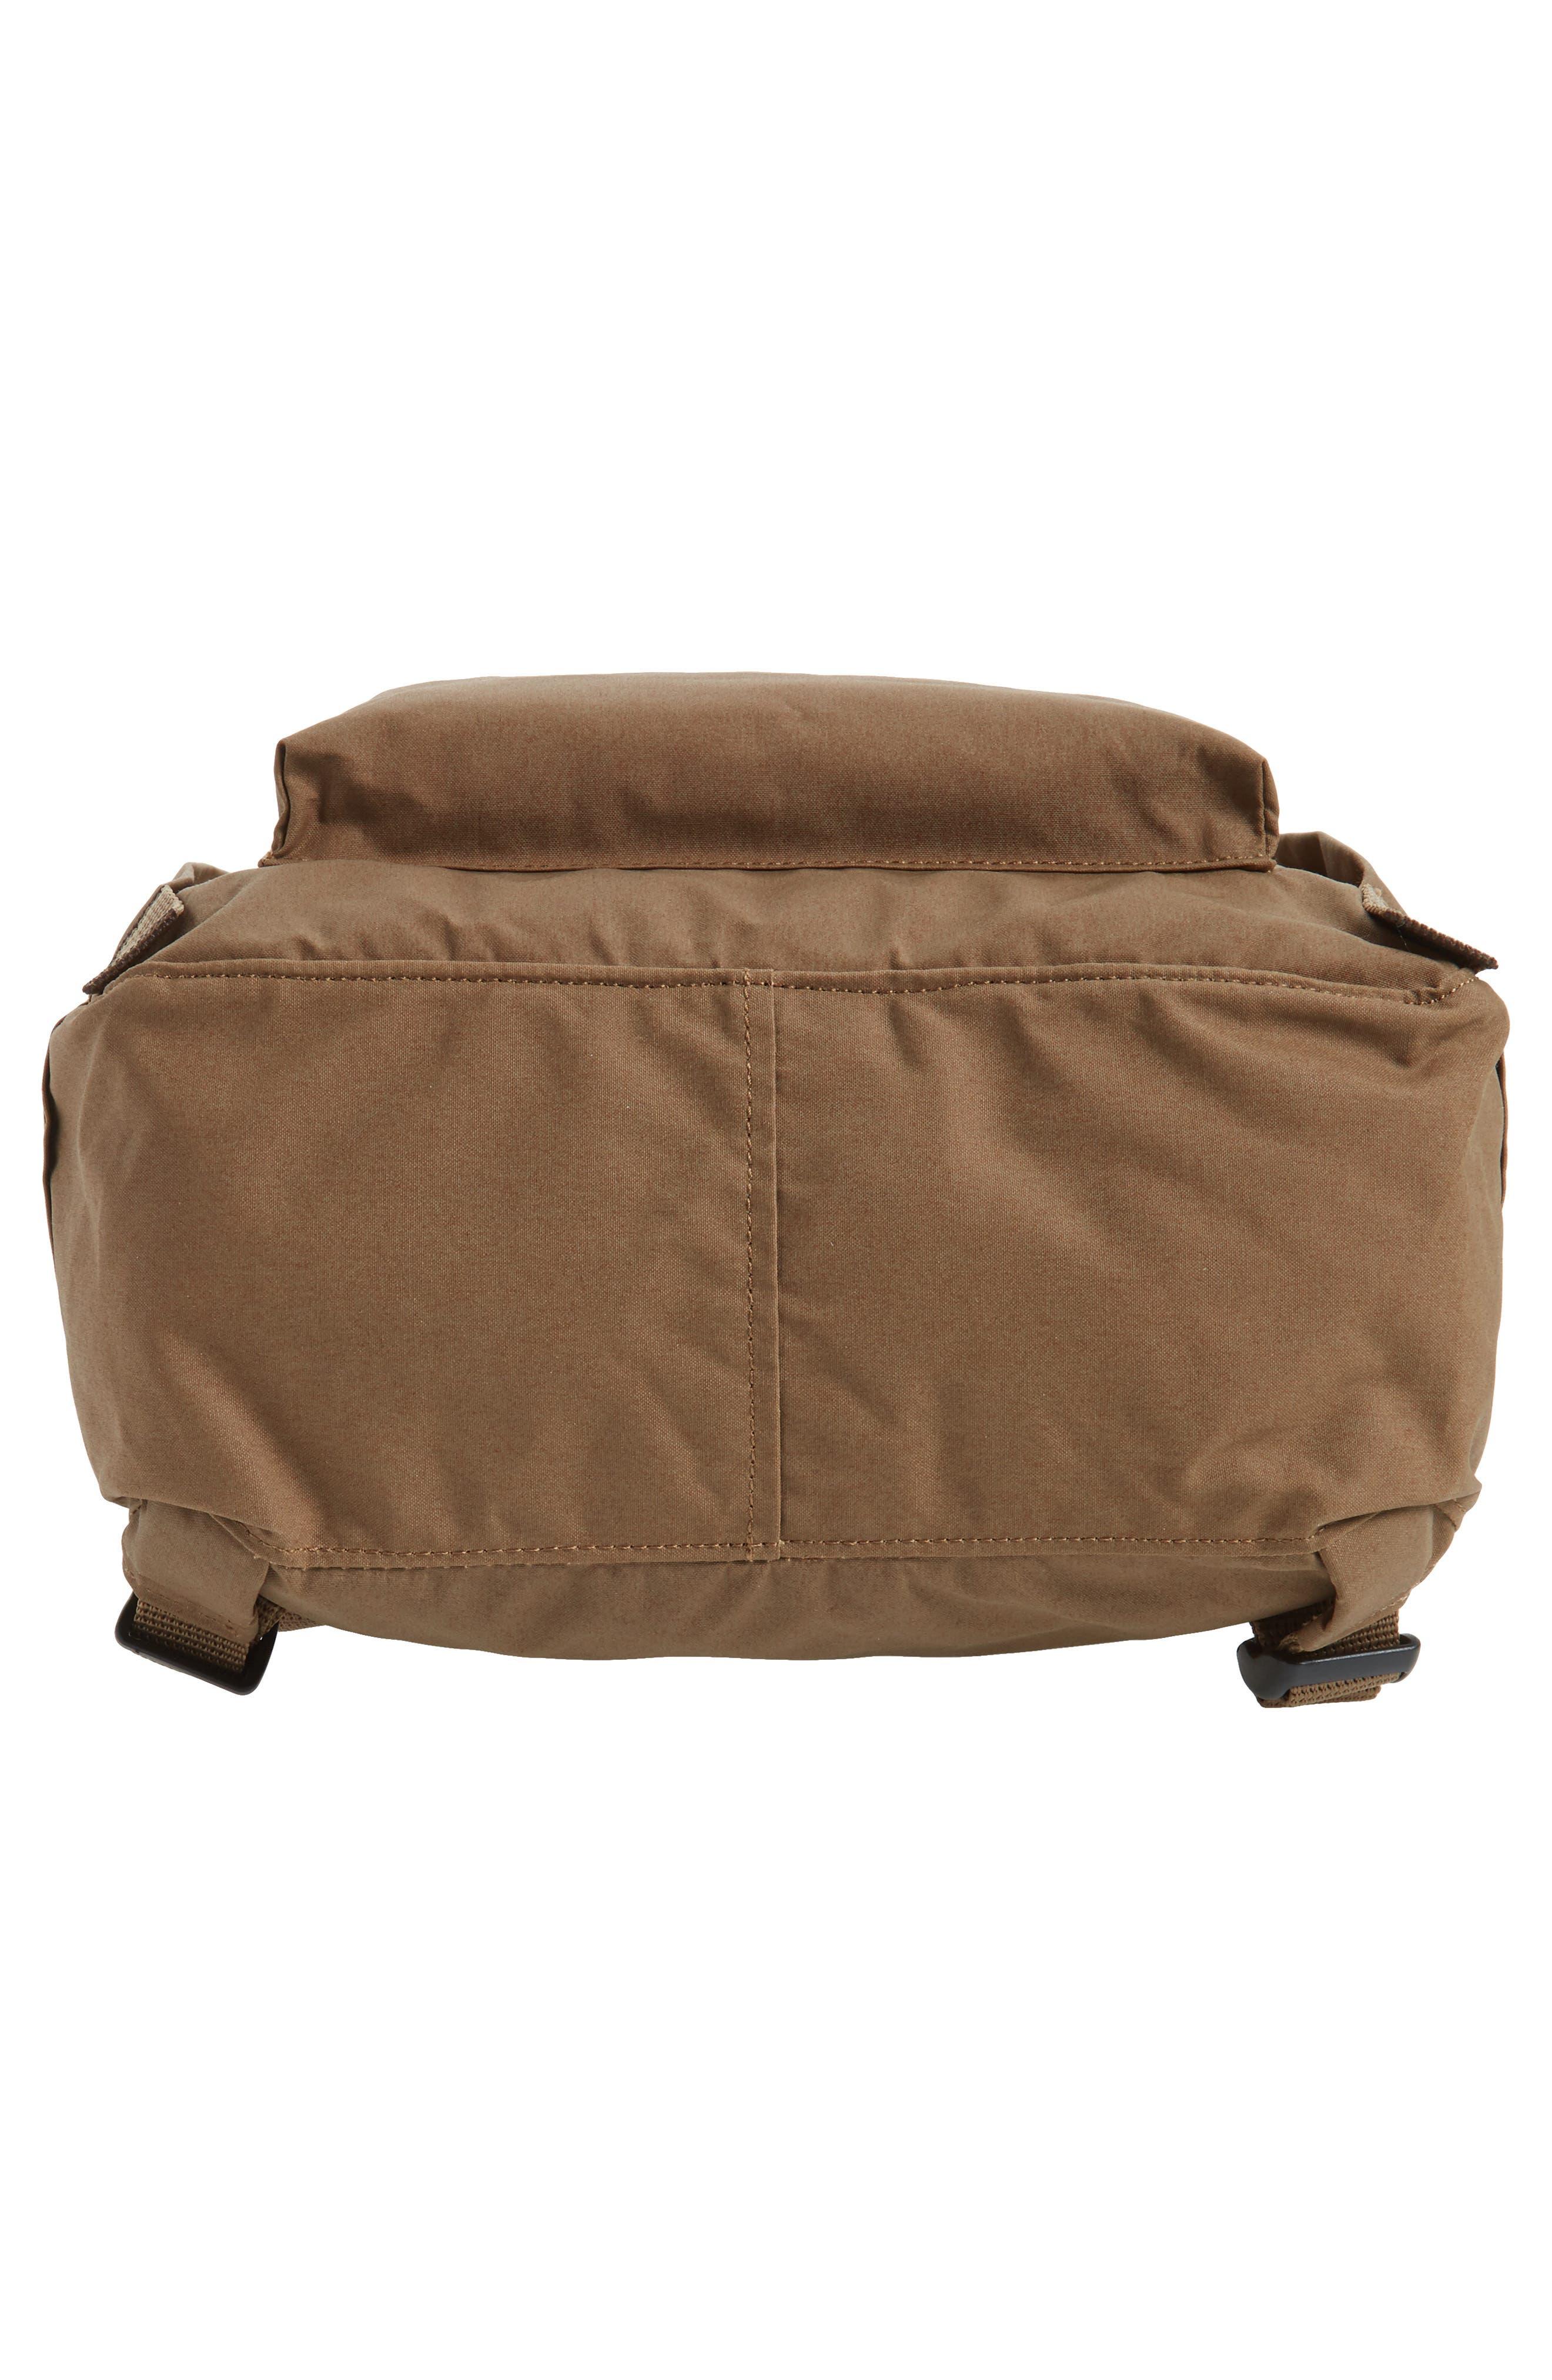 'Kånken' Water Resistant Backpack,                             Alternate thumbnail 348, color,